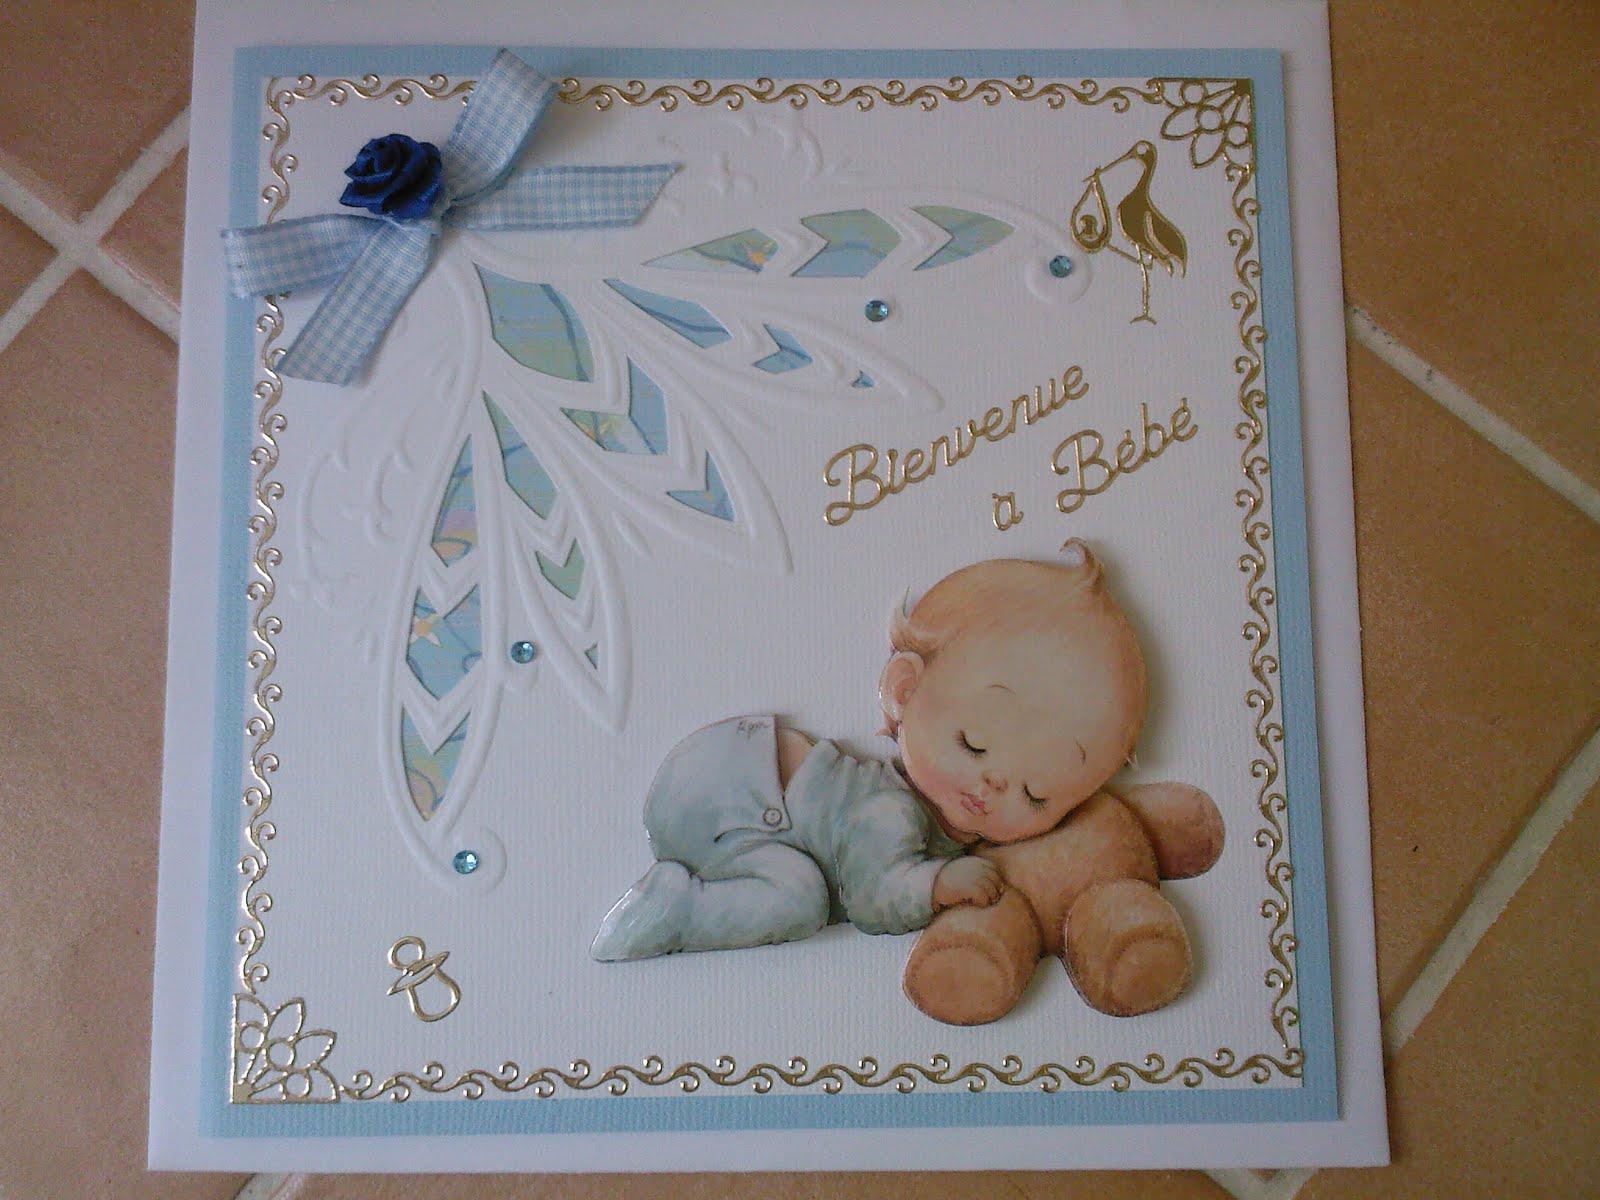 Au bonheur des cartes chut b b dort for Chut bebe dort pancarte